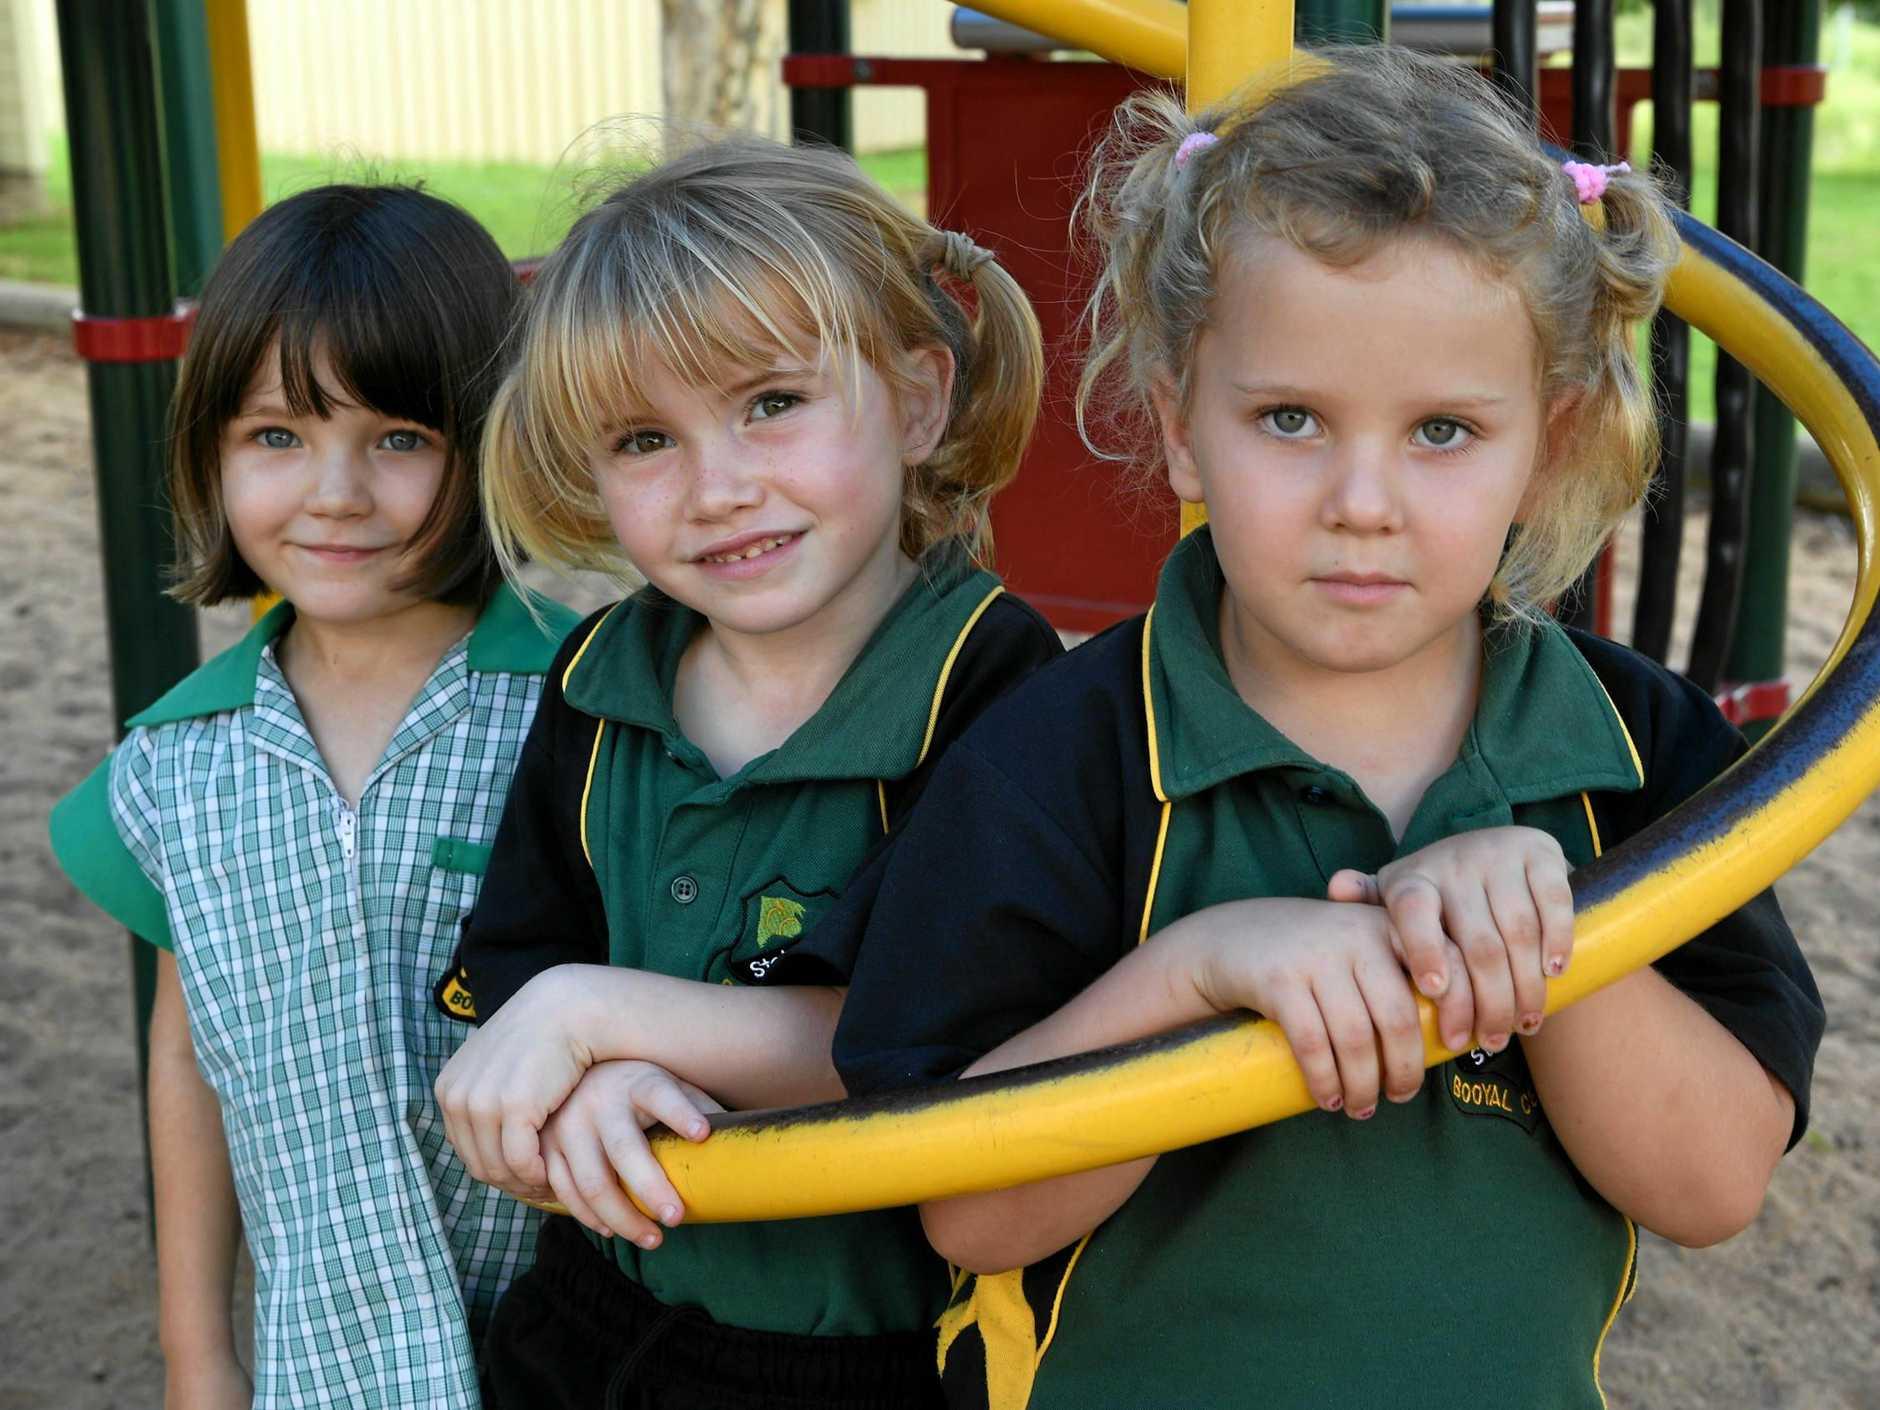 BOOYAL CENTRAL STATE SCHOOL PREP: Sophia Mandrek, Tara Wallis and Olivia Vaughan.